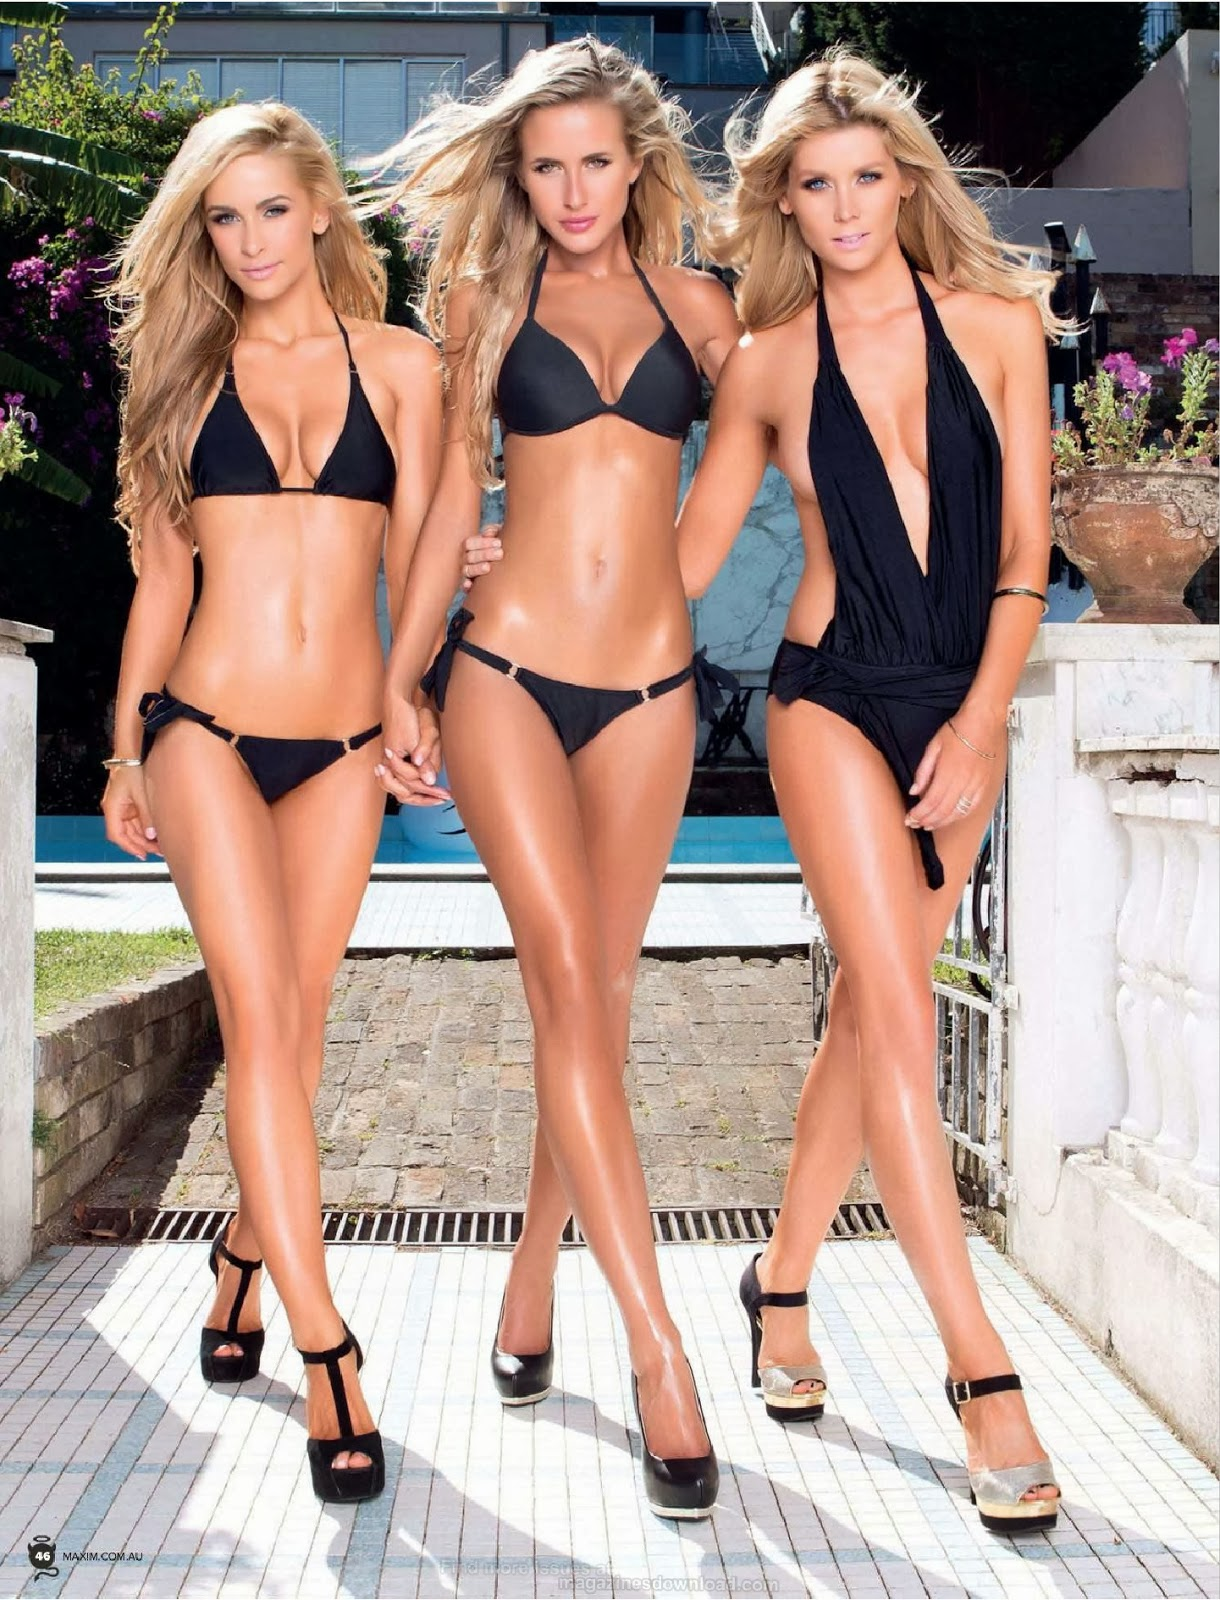 Ellie Gonsalves, Renee Somerfield And Sheridyn Fisher Photoshoot For Maxim Magazine Australia February 2014